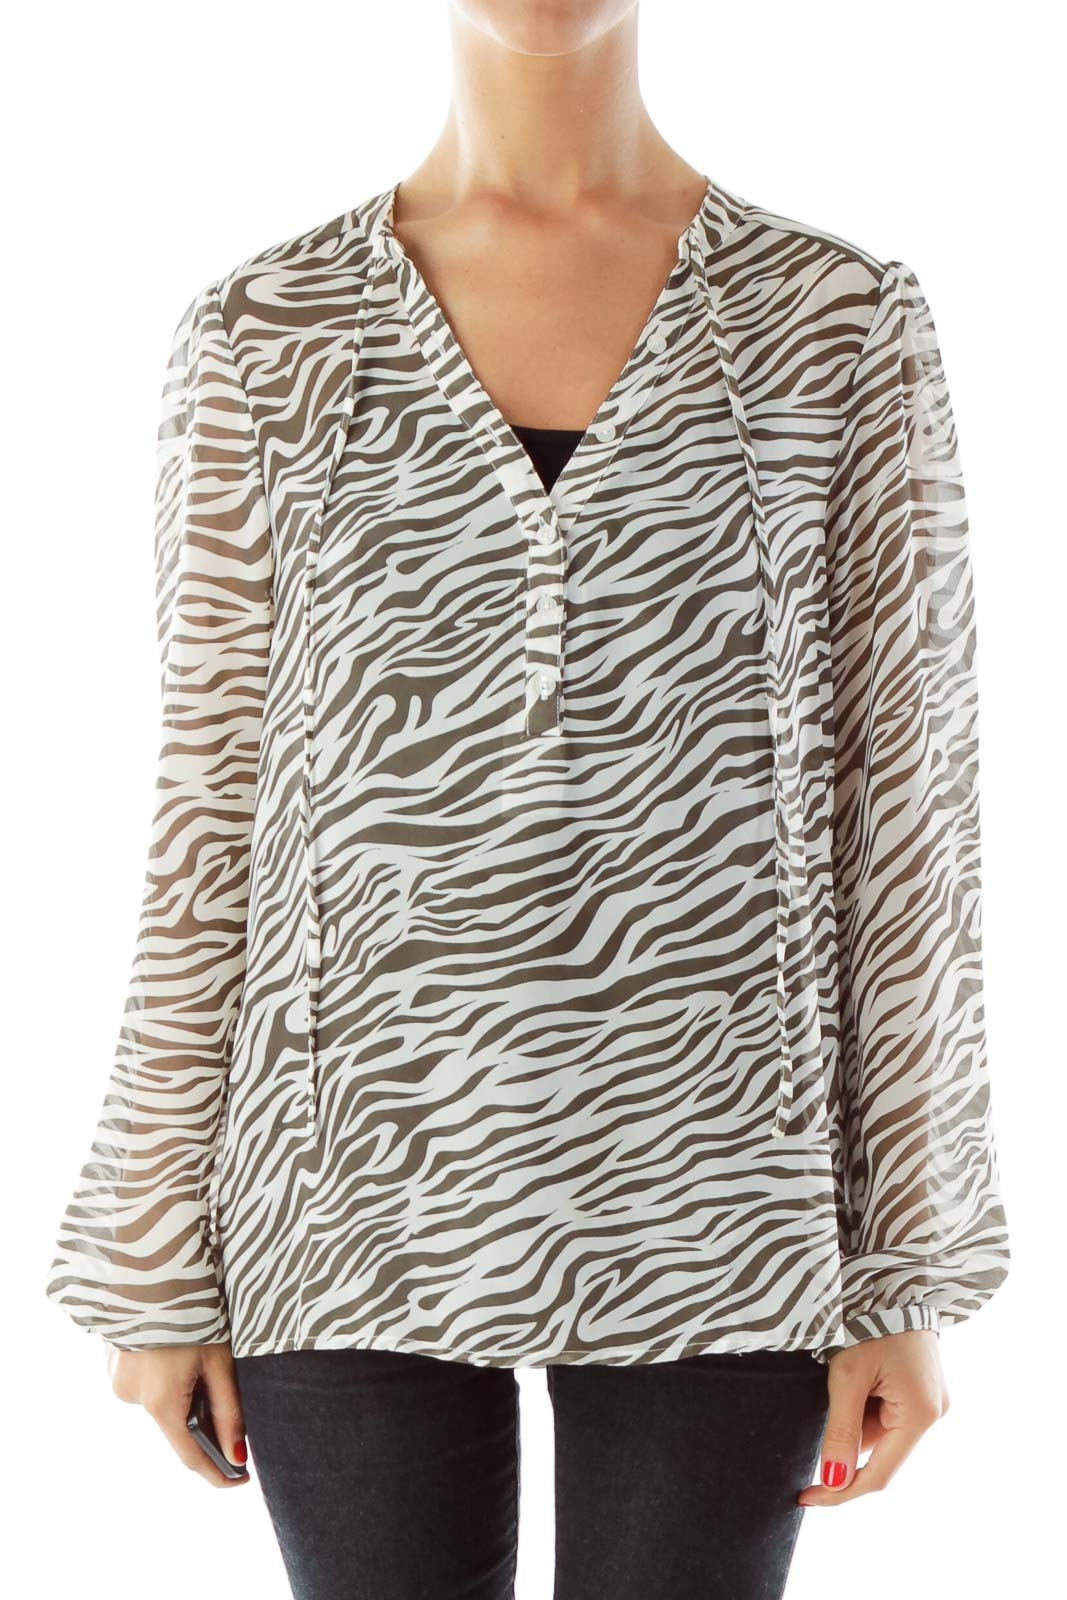 Black & White Zebra Print Loose Top